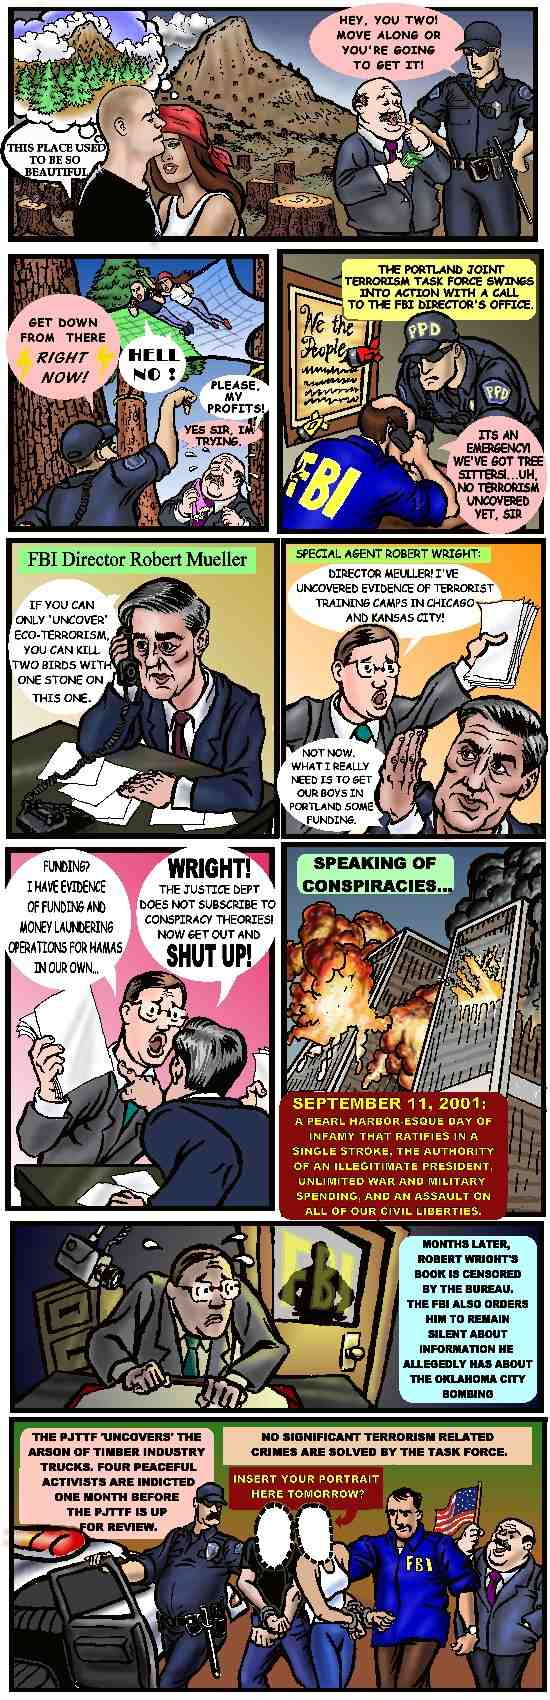 FBI, Terrorism, and ...